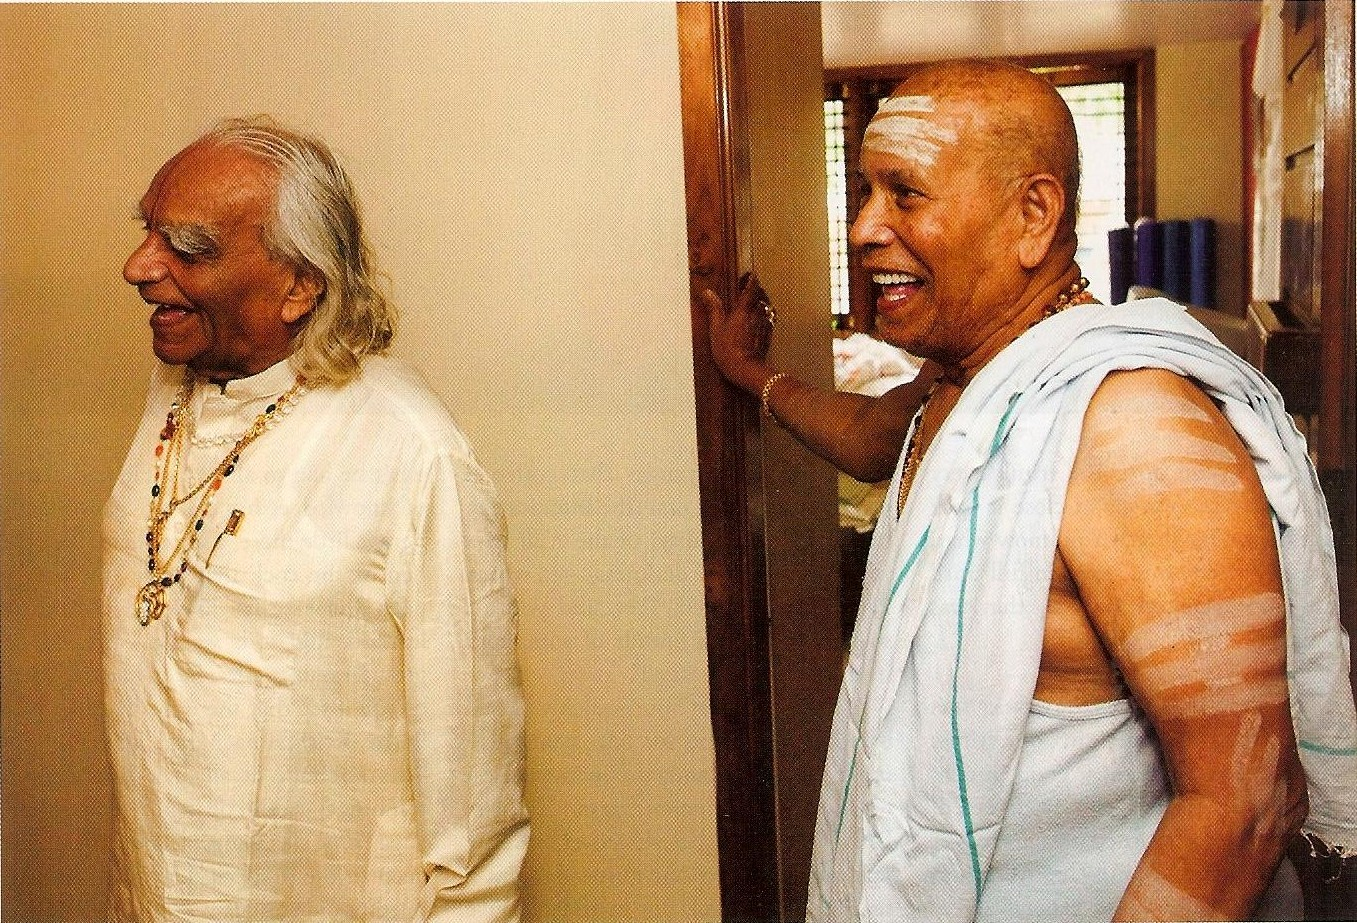 B.K.S. Iyengar and Pattabhi Jois